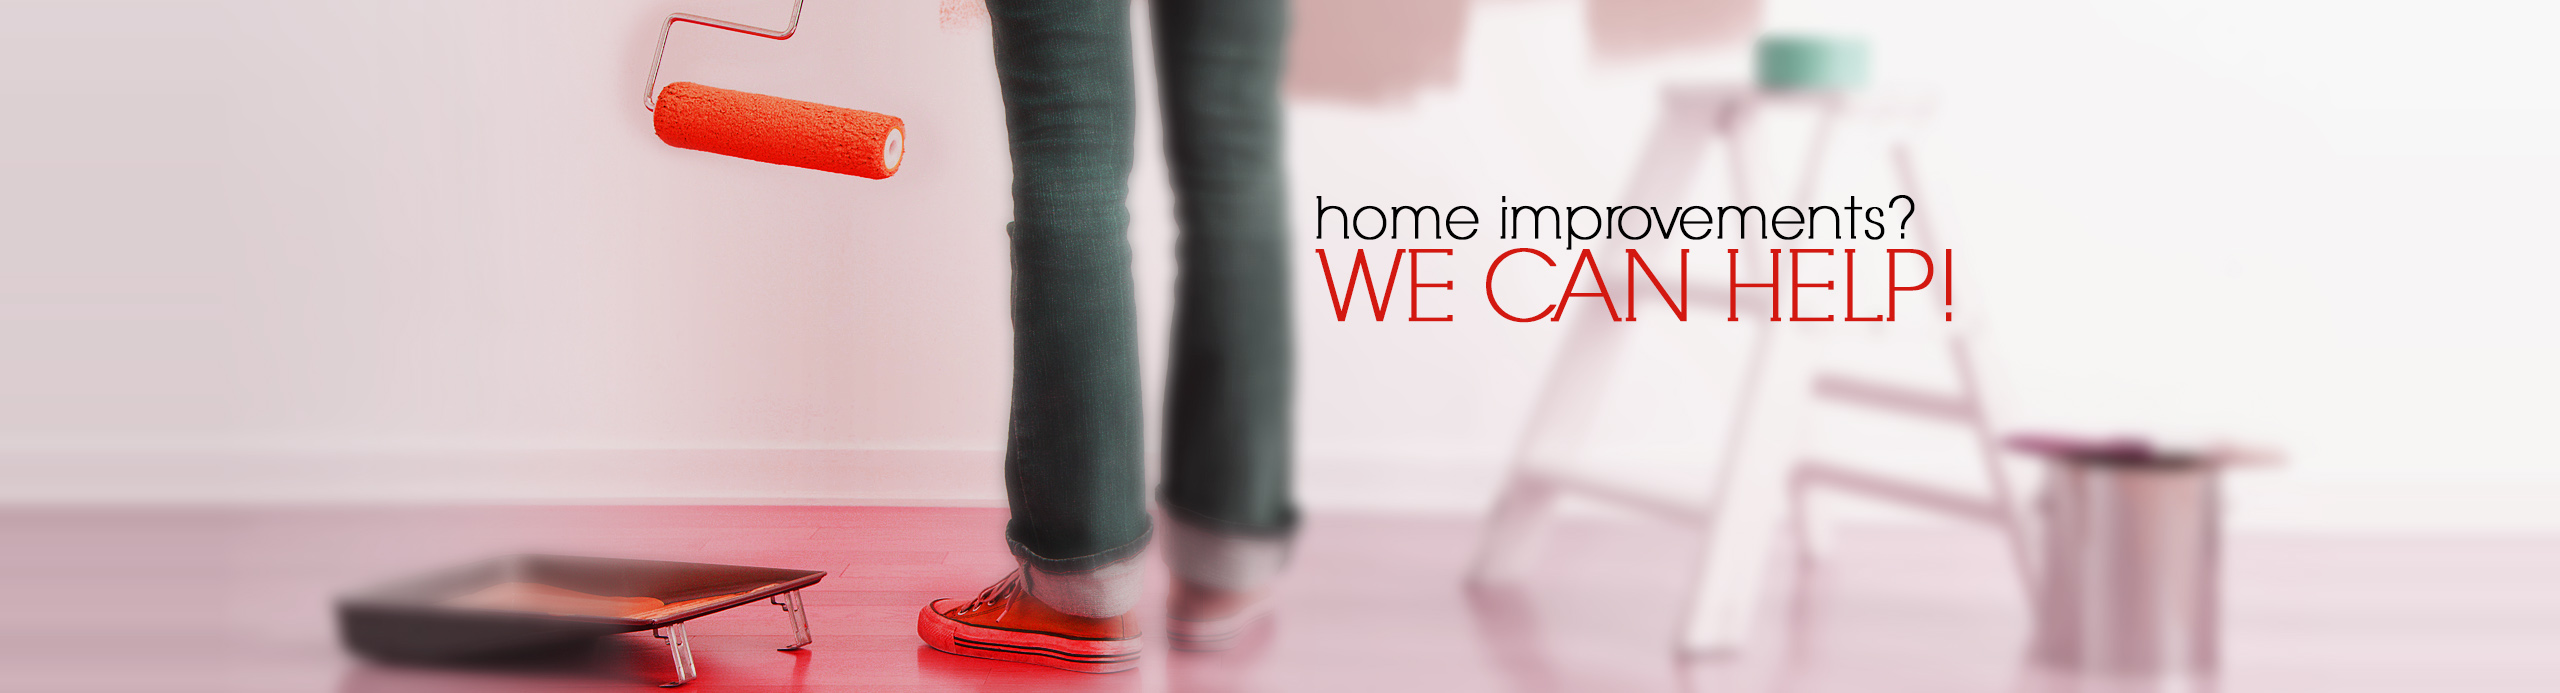 Home improvements, Kitchen, Bathroom, refurbishment Plymouth Deven, Saltash Cornwall